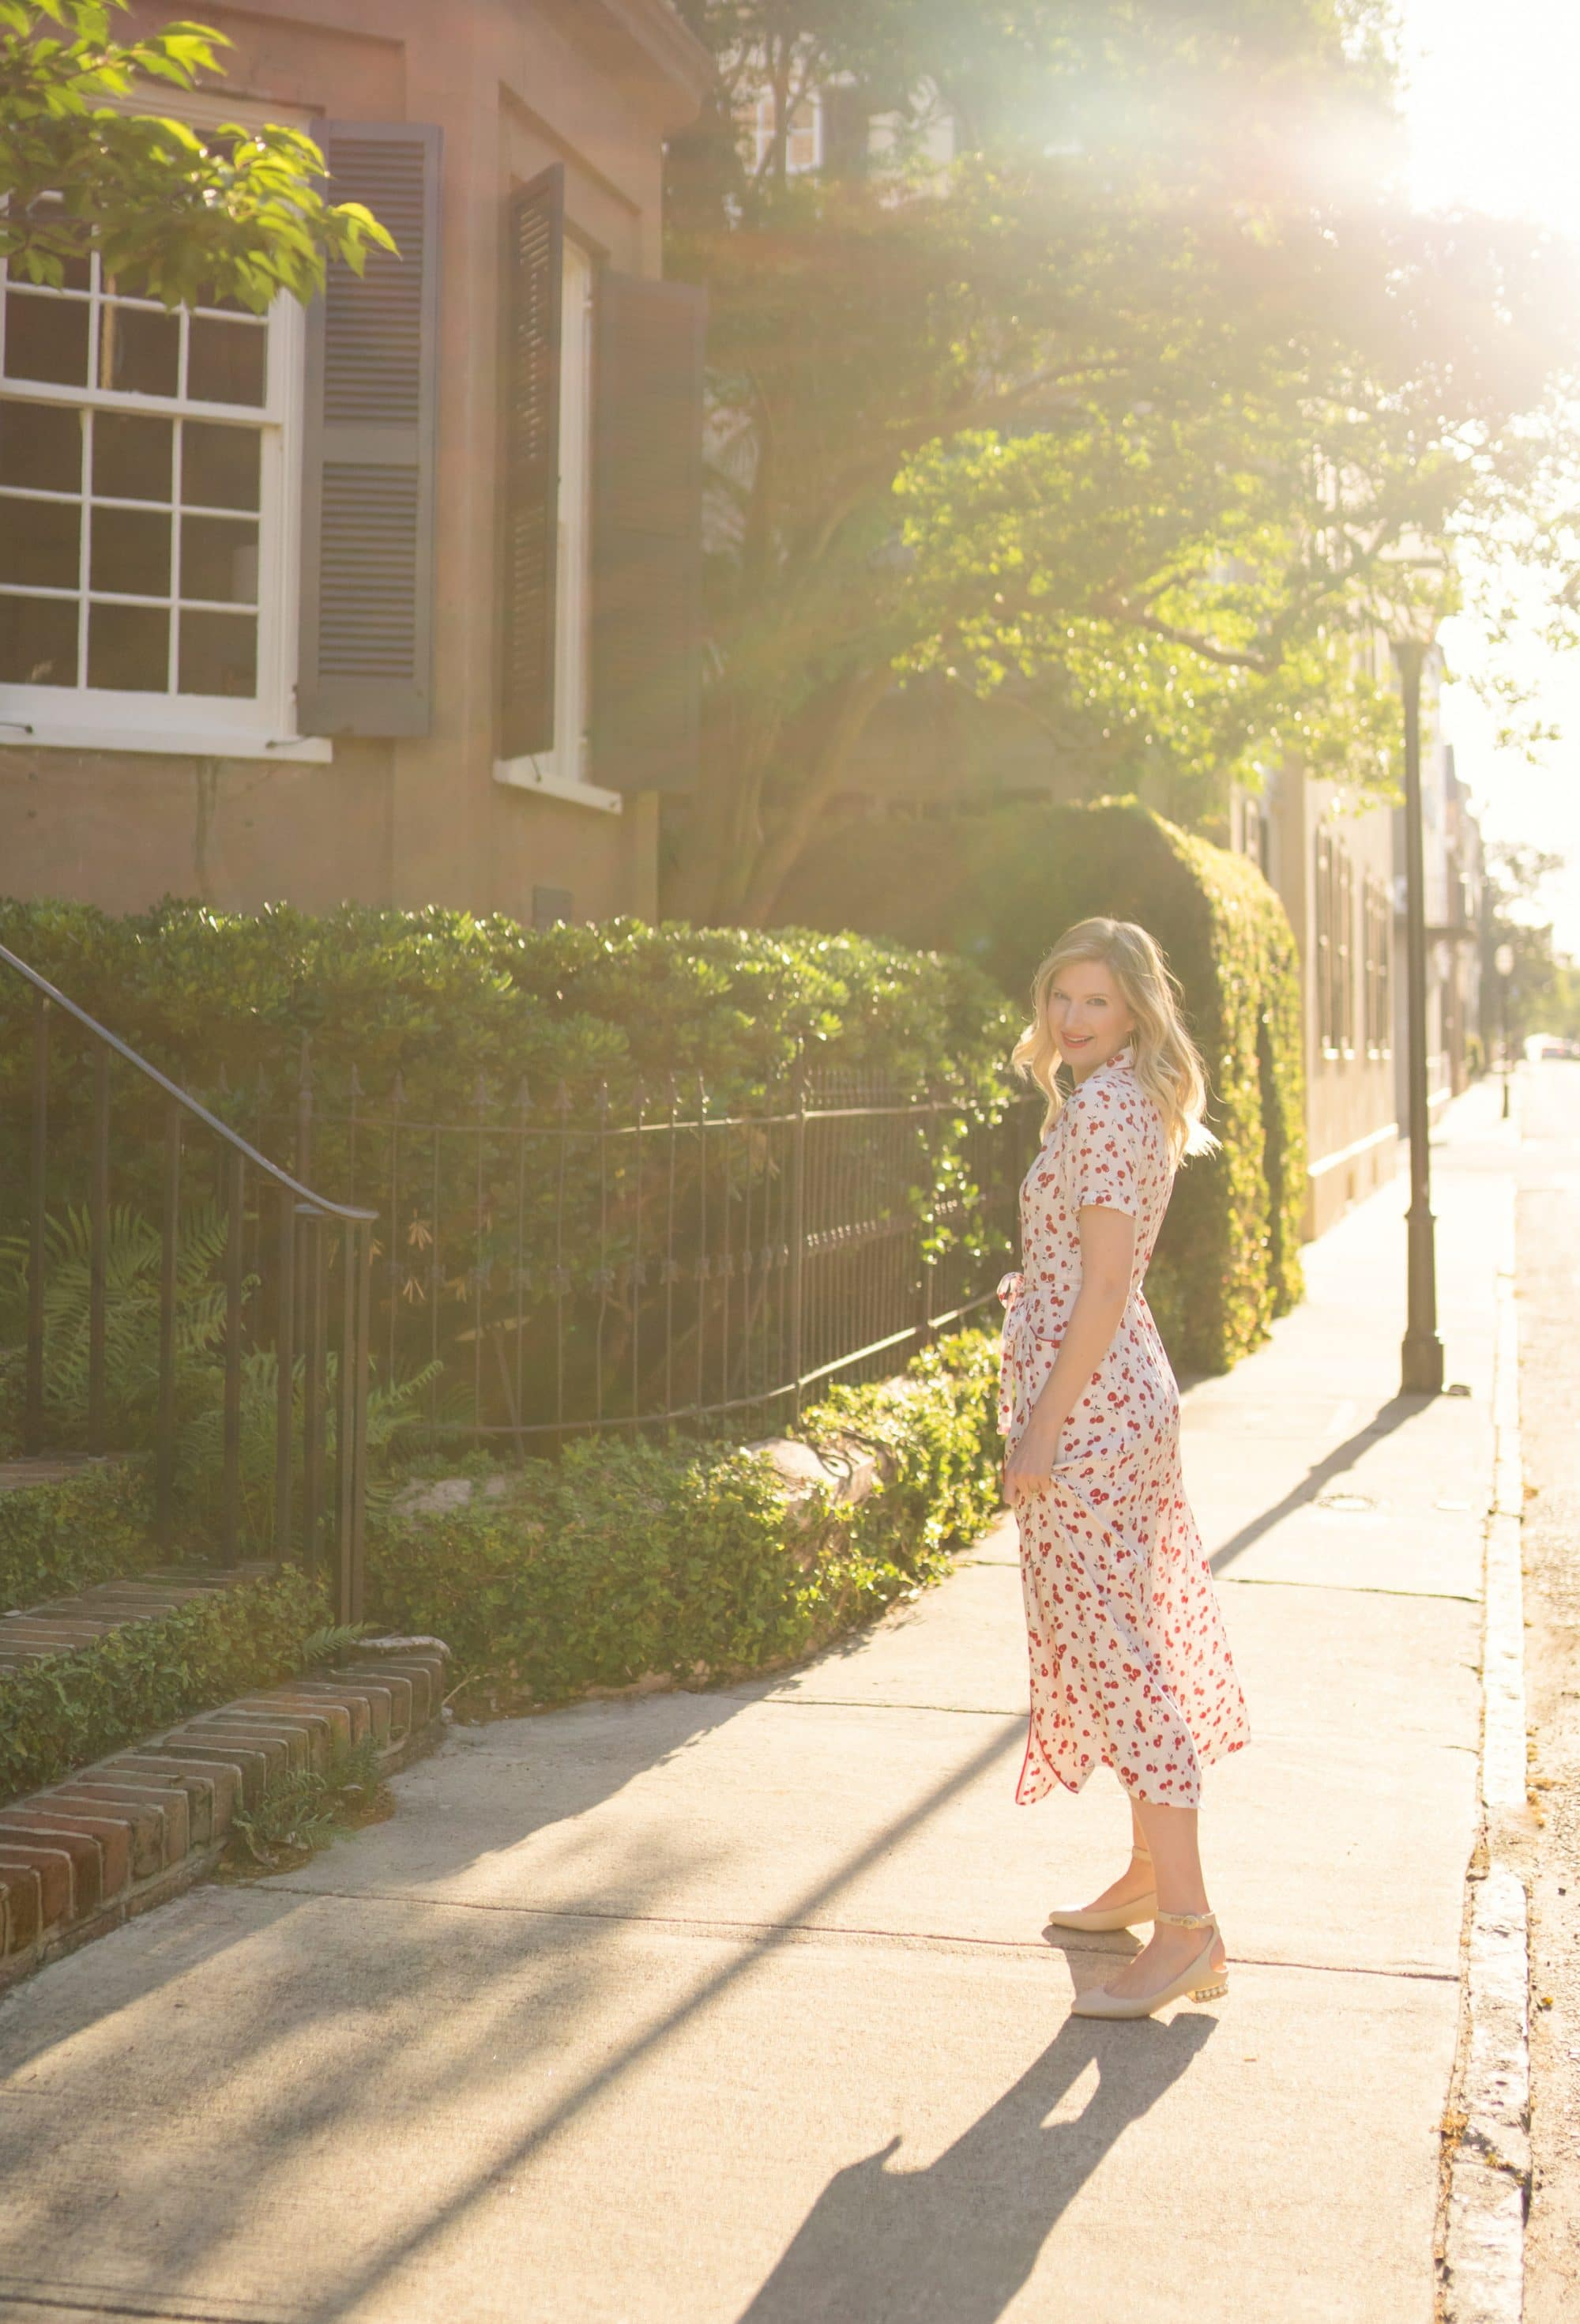 Hampden Clothing Charleston, SC | HVN Cherry Morgan Dress | www.ashleybrookedesigns.com